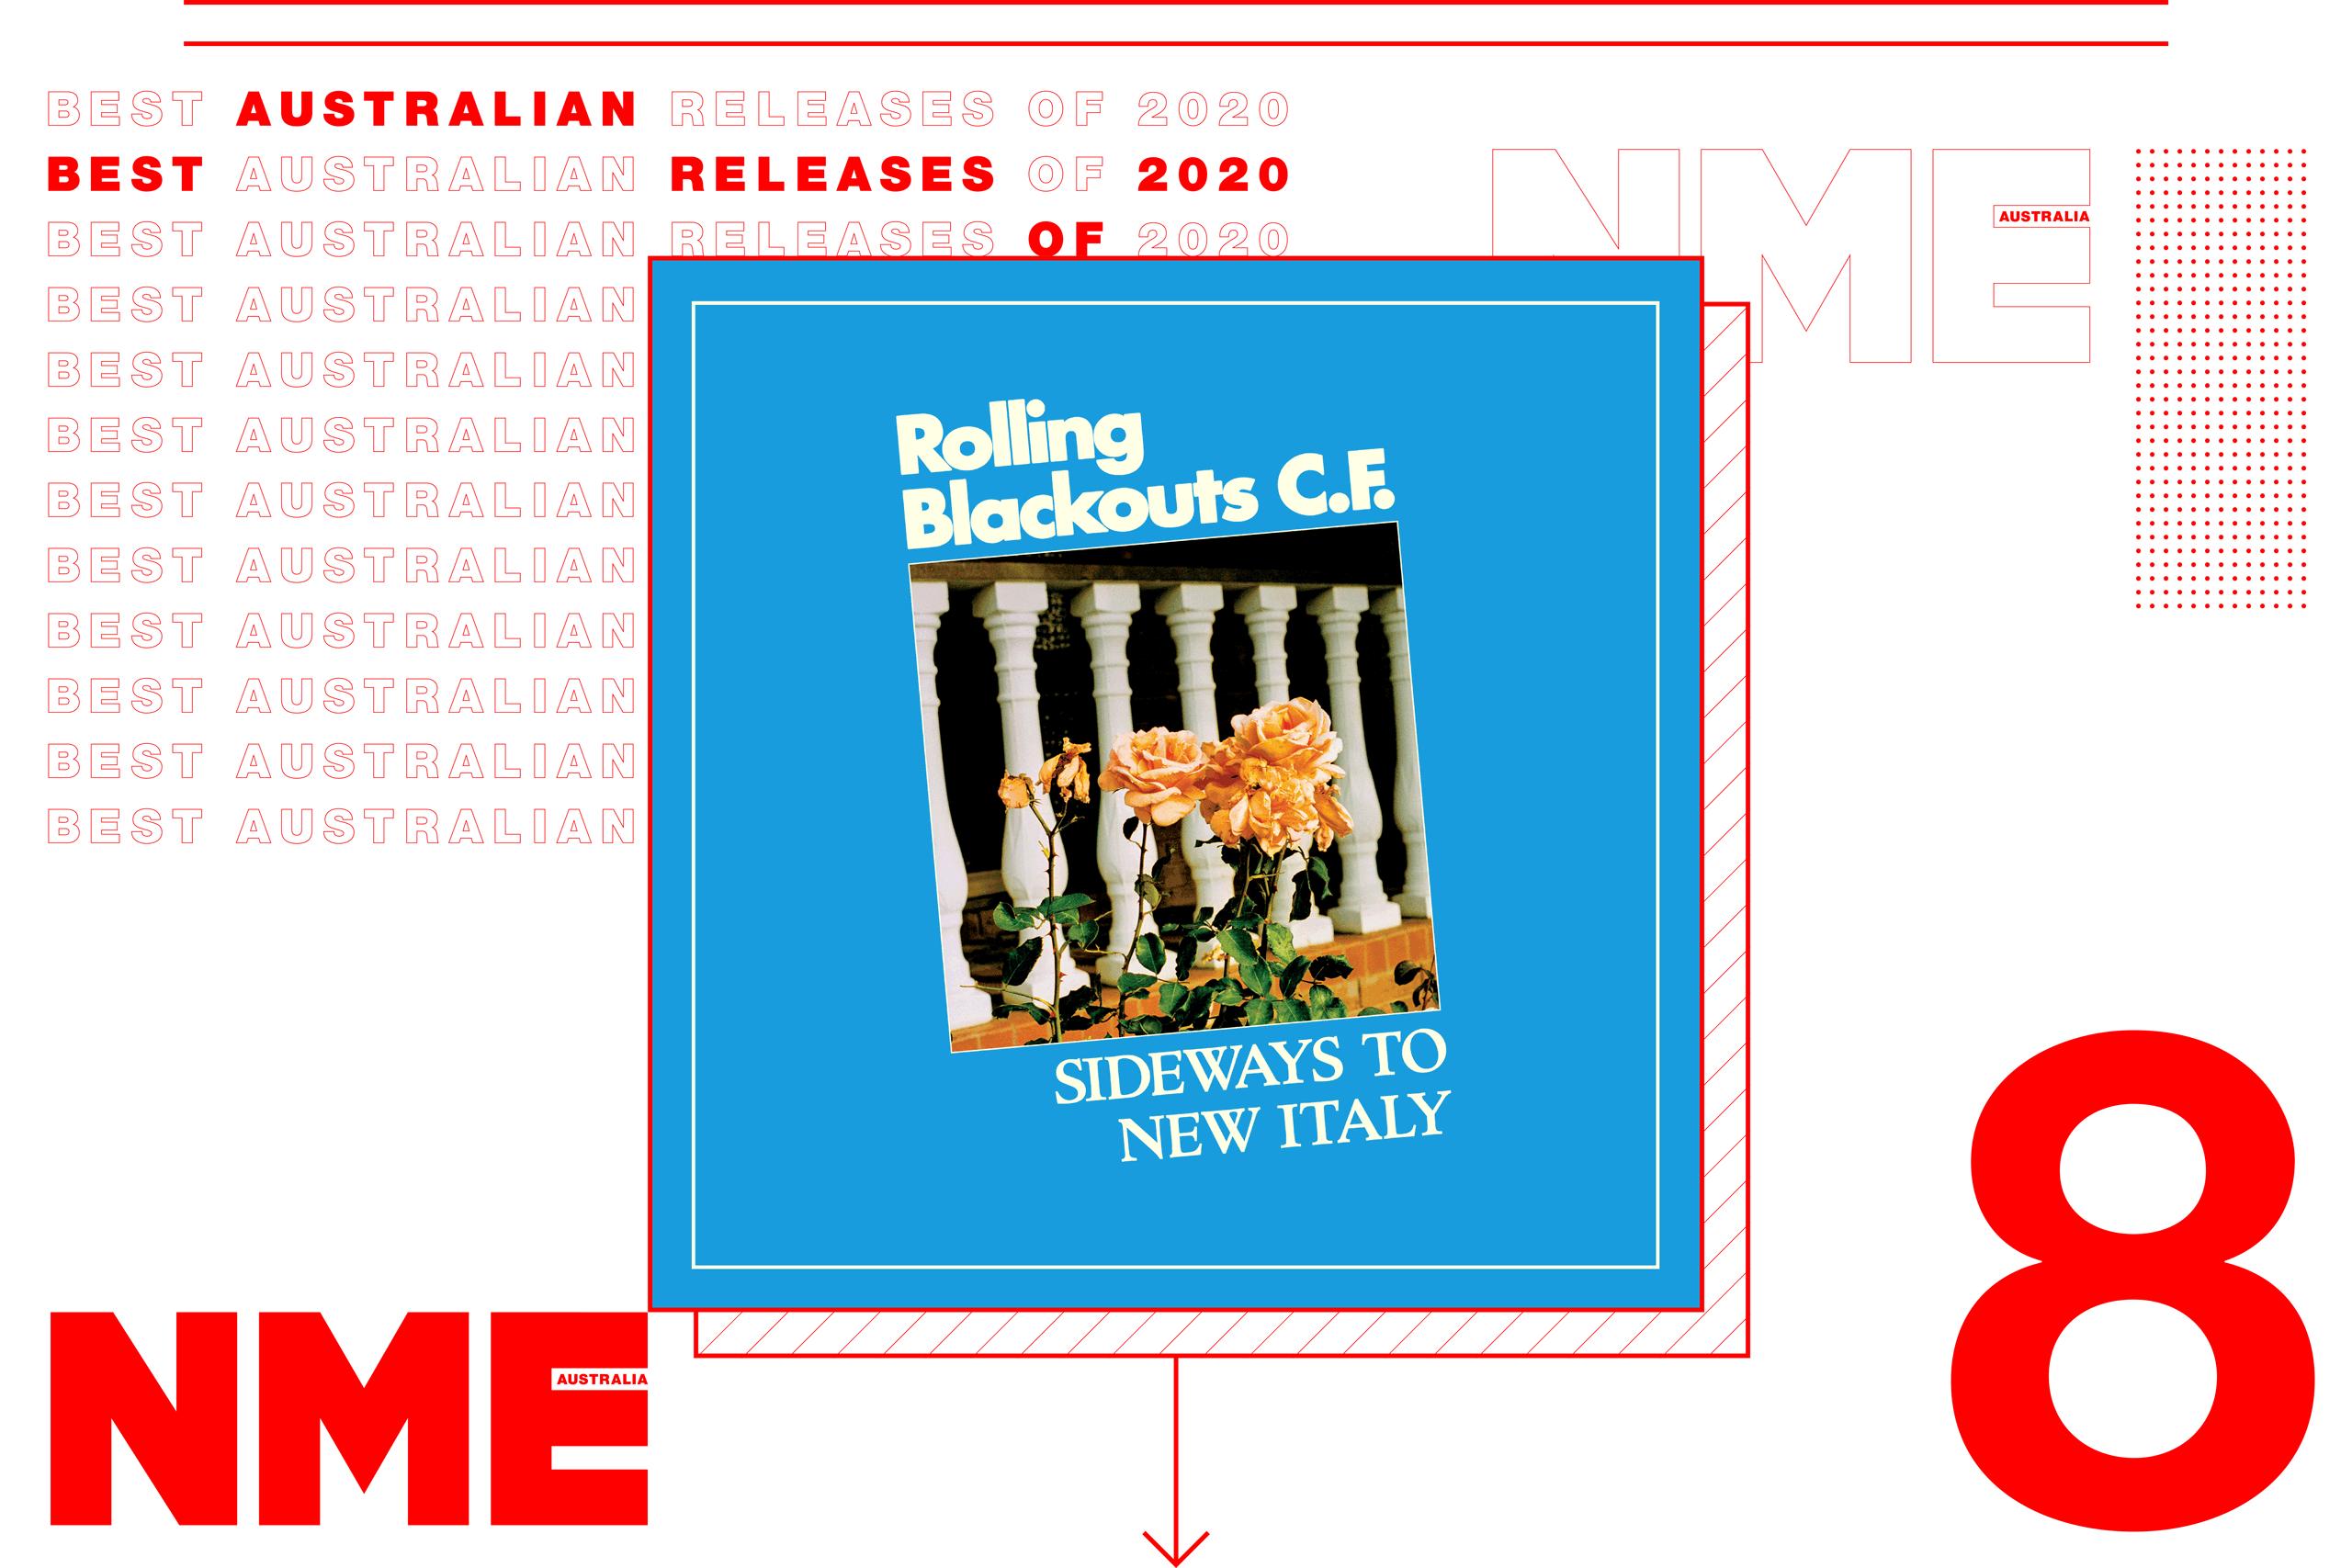 NME Australian Album Release 8